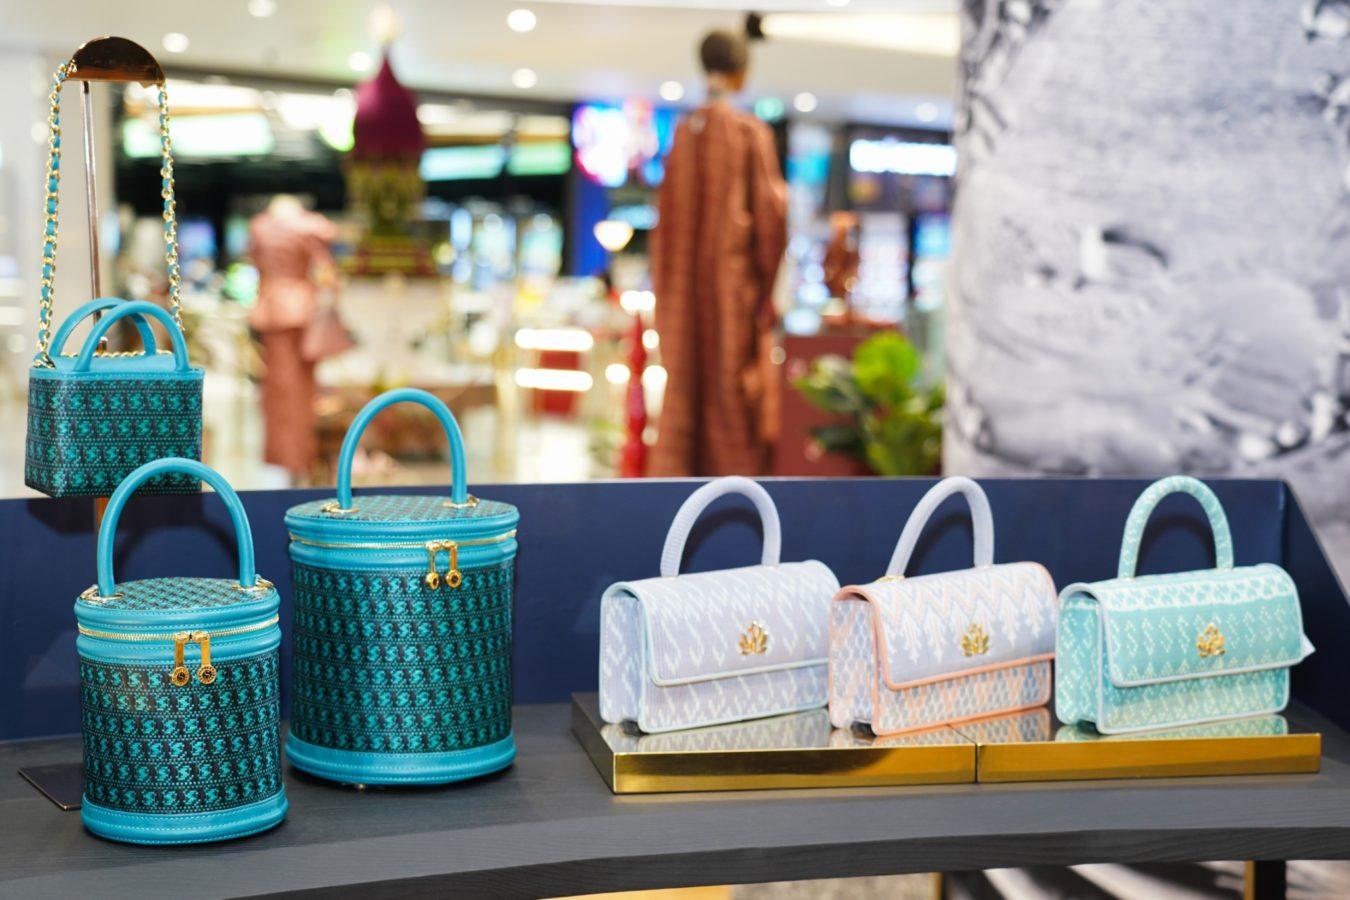 Sirivannavari Bangkok Unveils S'Craft Craftsmanship 2021with Exquisite Purses Made from Artisanal Thai Silk